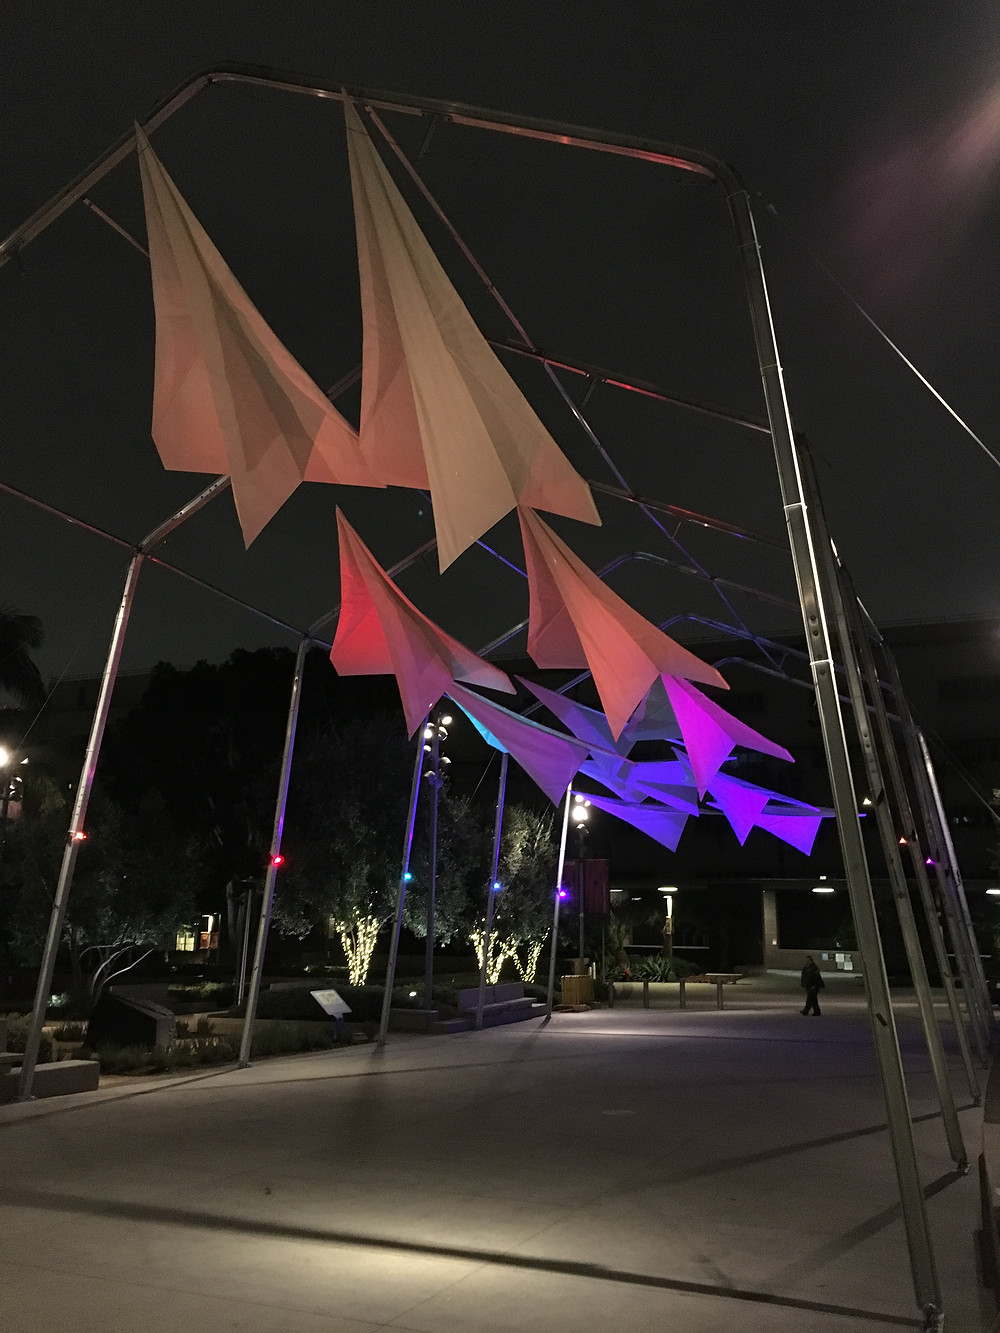 Custom Fabricated LED-lined Flying Scenery!